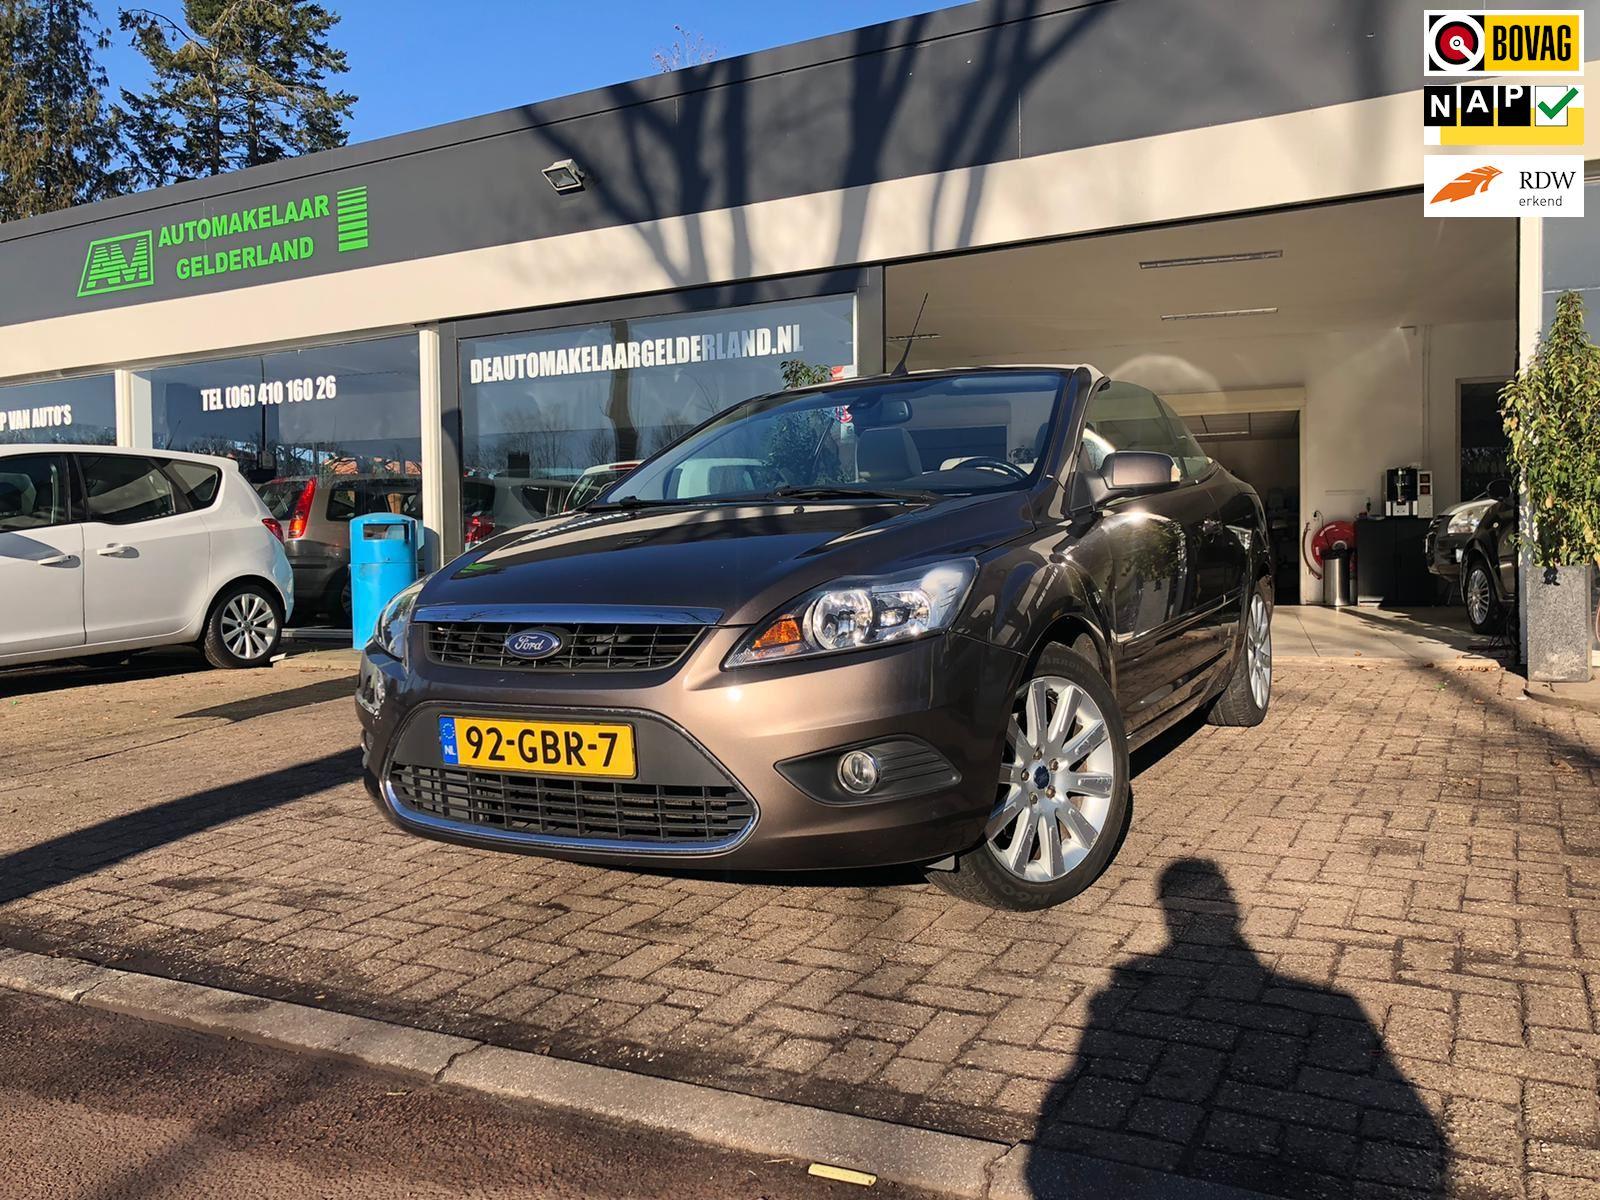 Ford Focus Coupé-Cabriolet occasion - De Automakelaar Gelderland